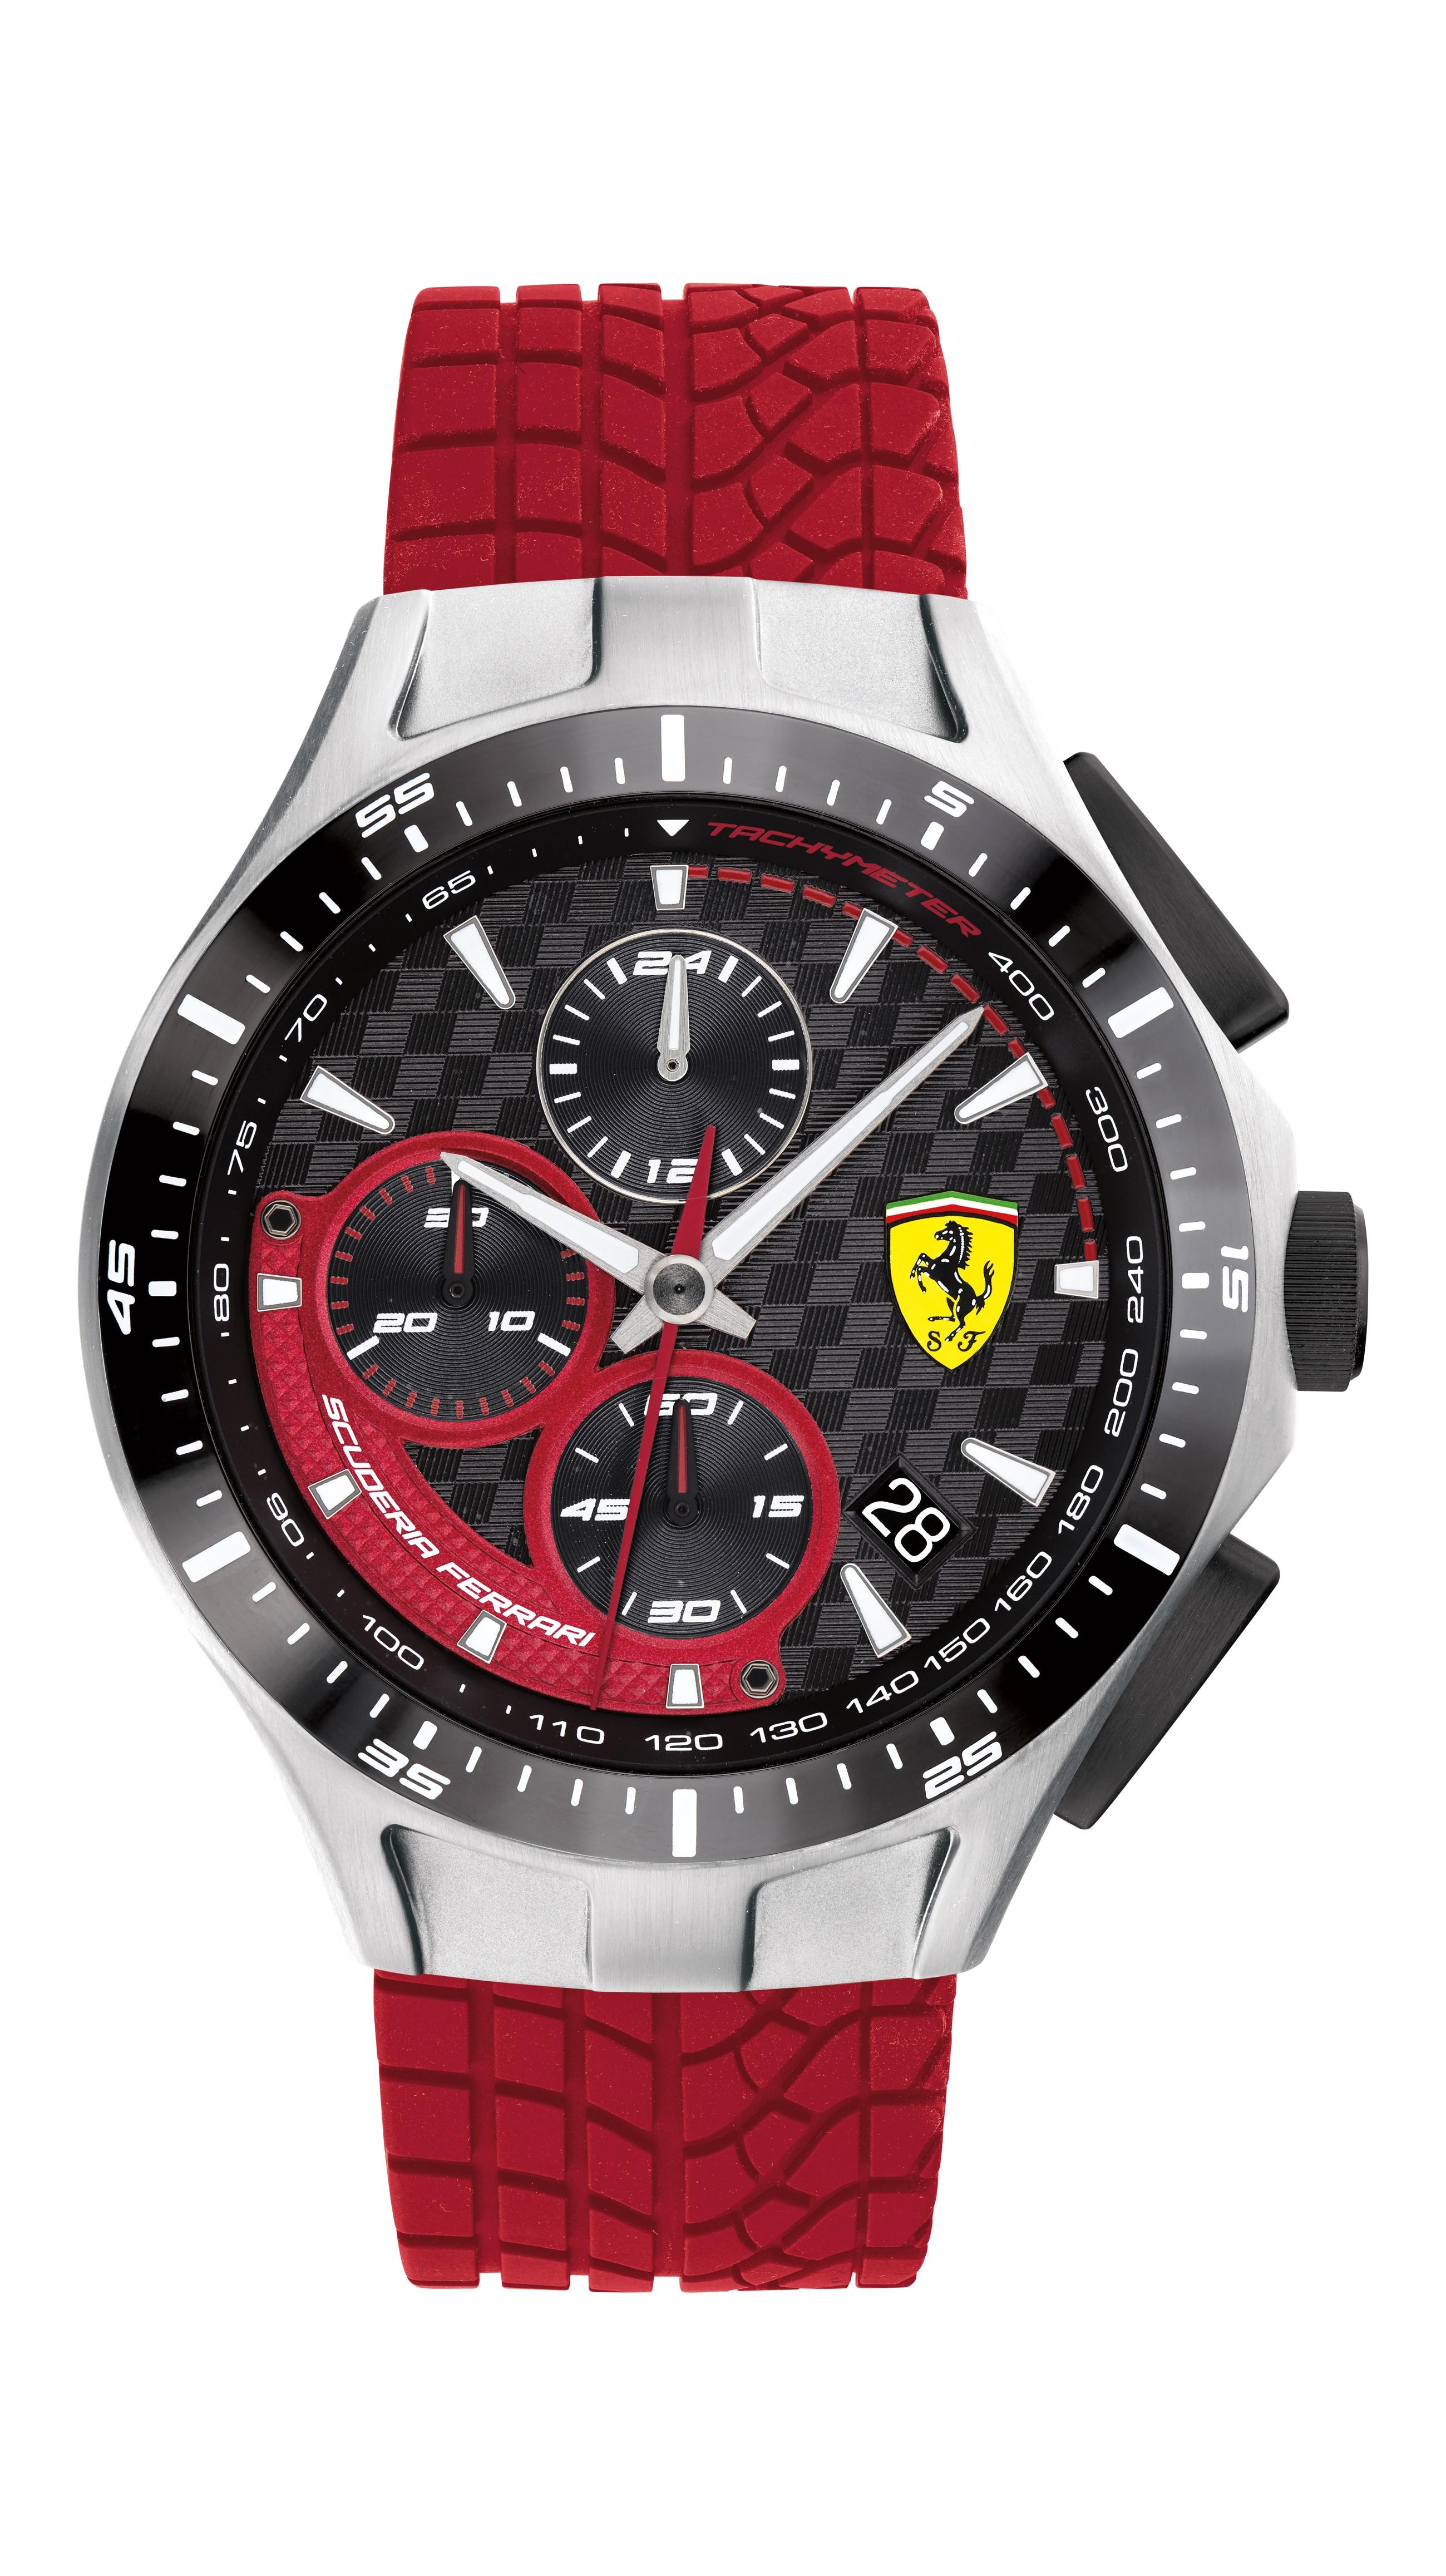 Ferrari 法拉利 賽車急速計時手錶-44mm(0830697)